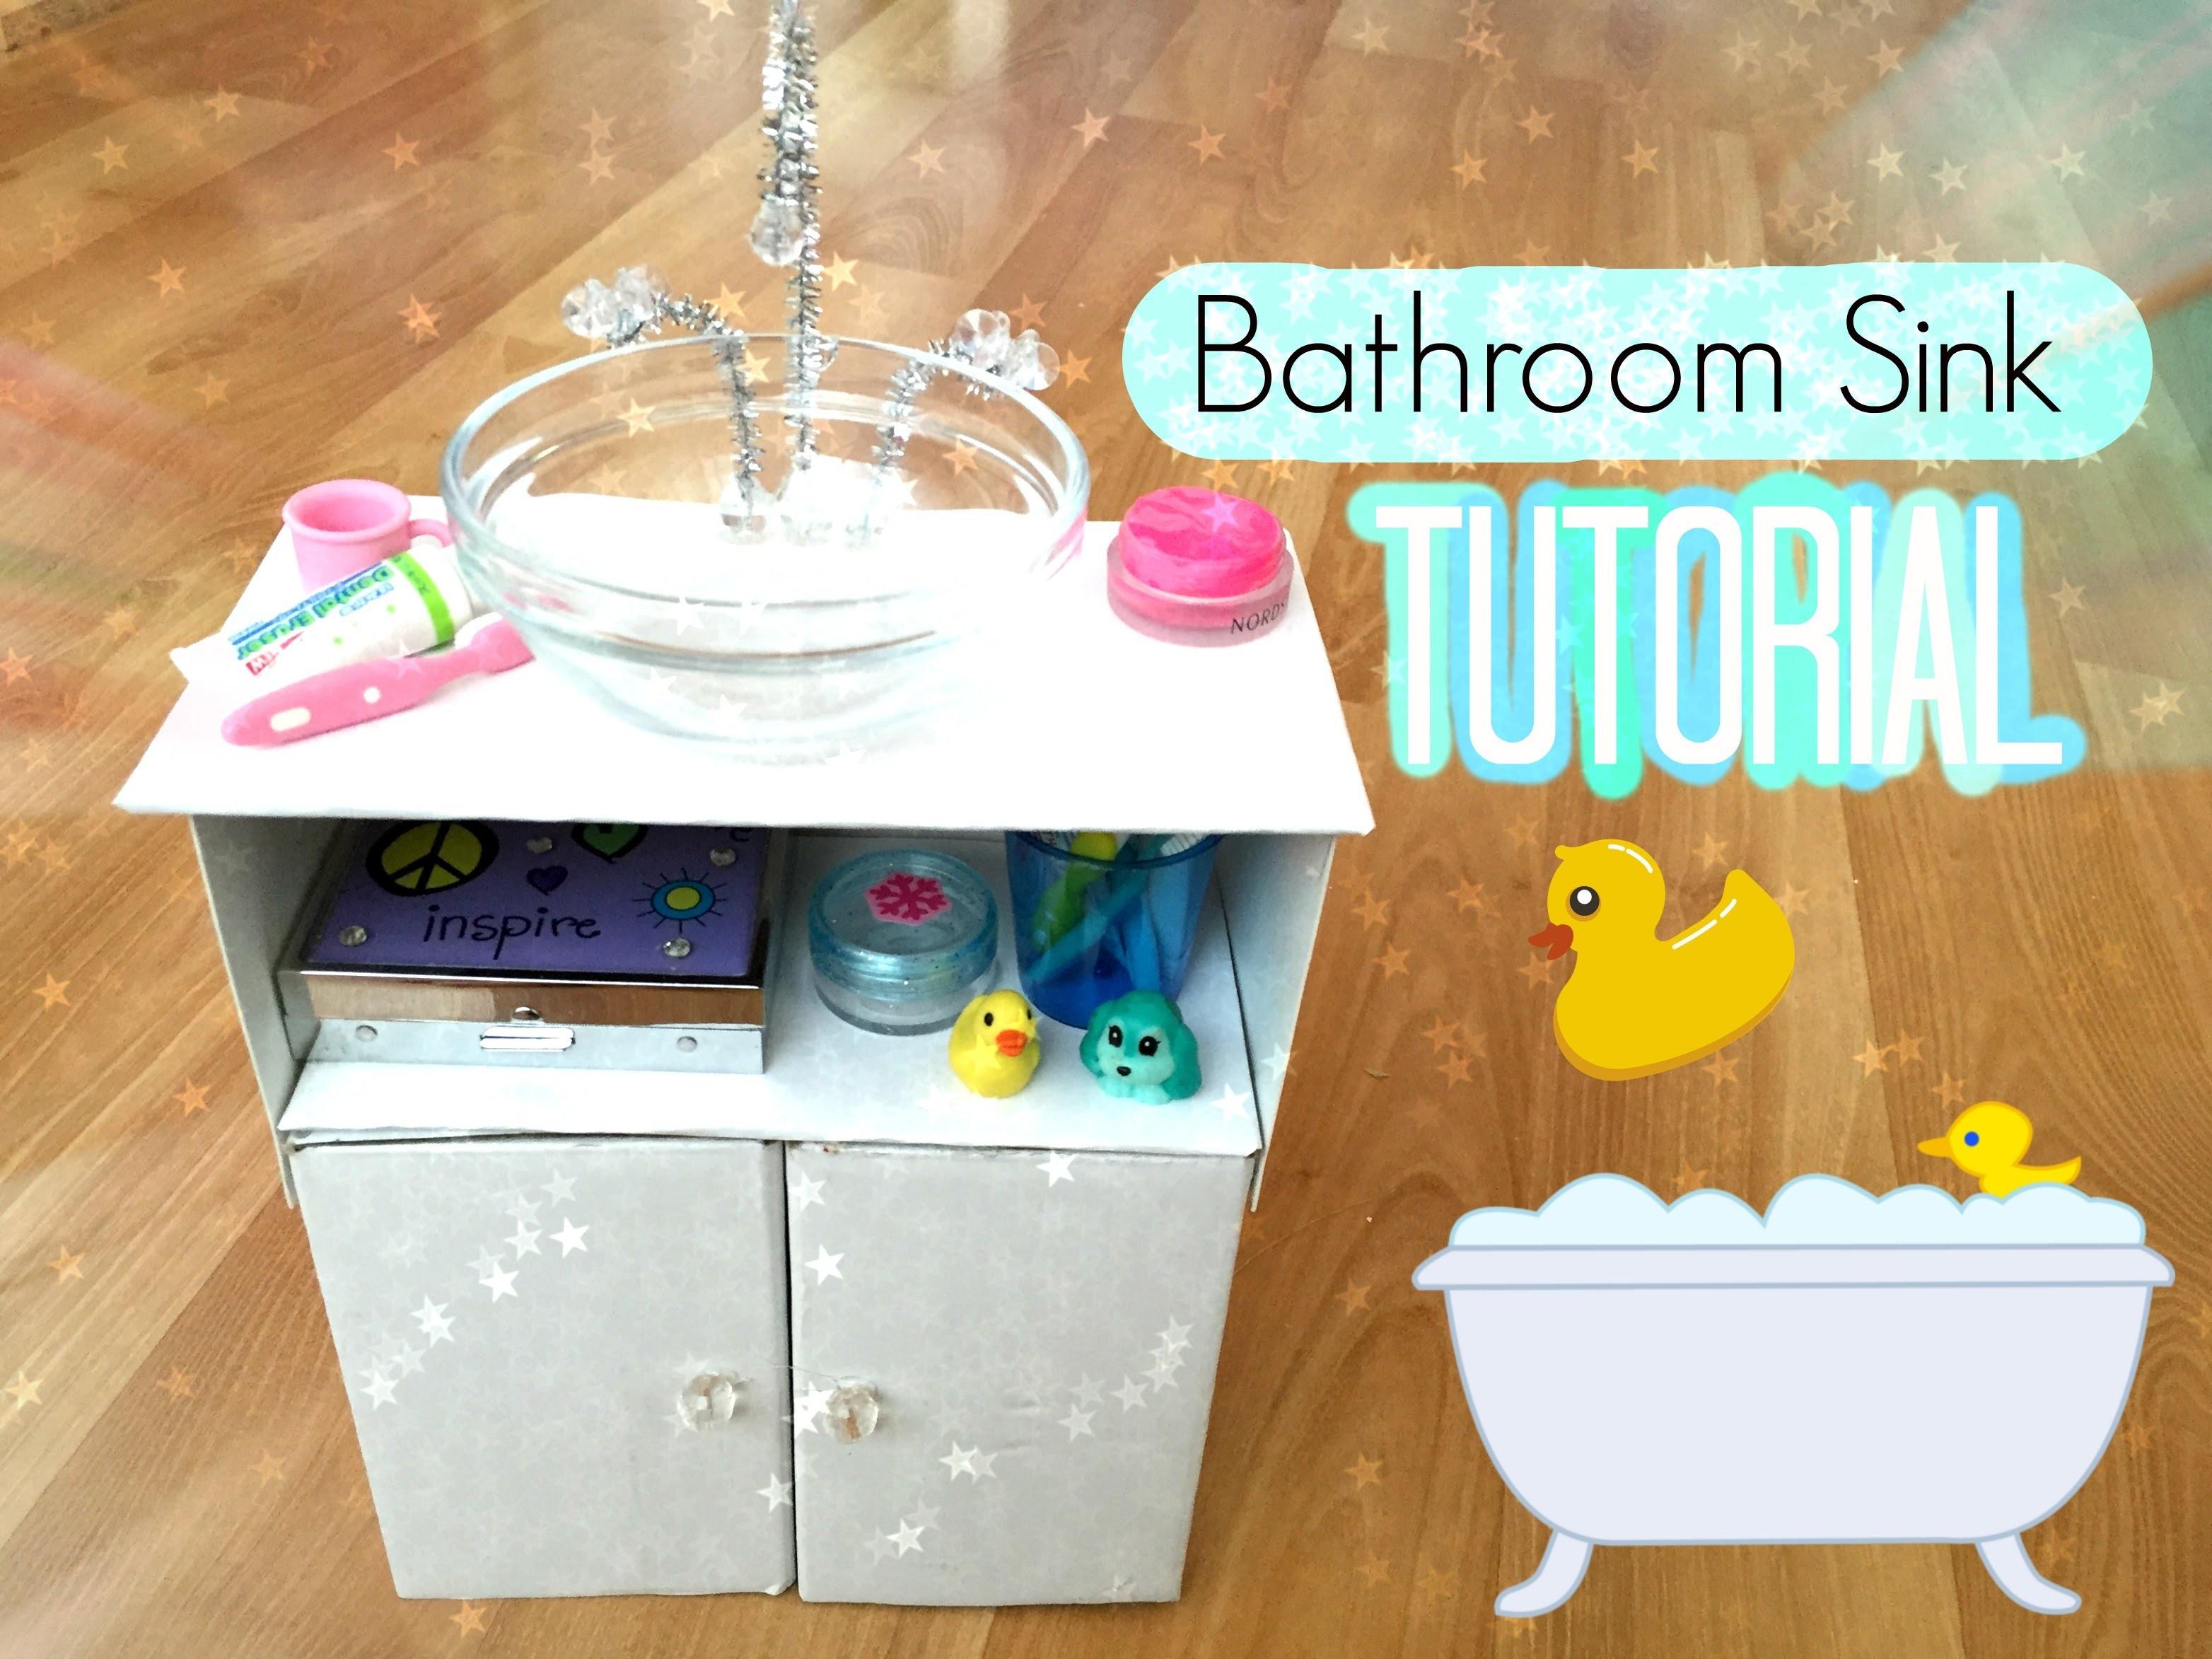 How To Make An American Girl Doll Bathroom Sink!